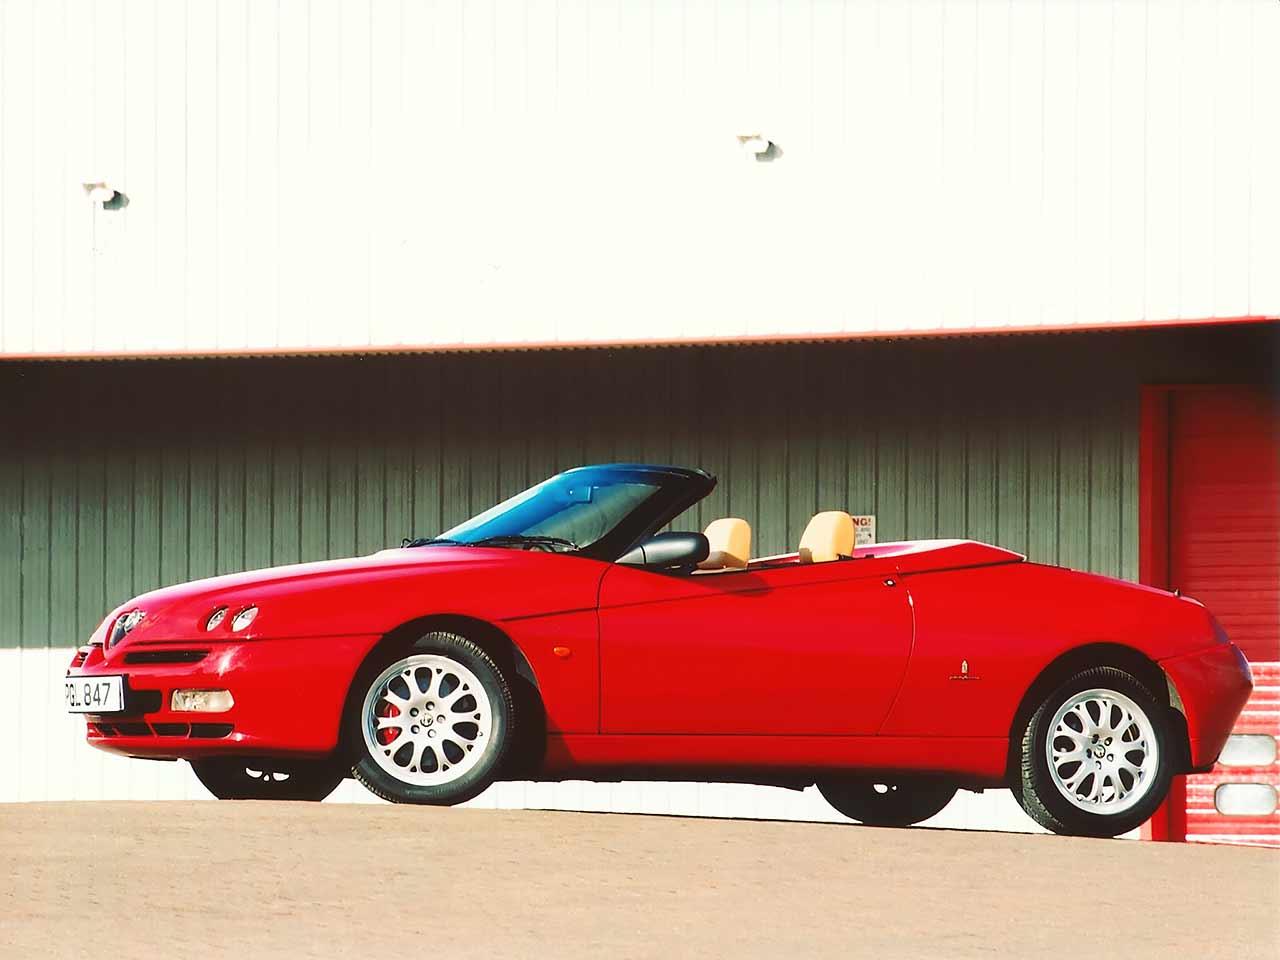 Alfa Romeo Spider UK-spec (916) '09.1998 - 05.2003 design by Pininfarina